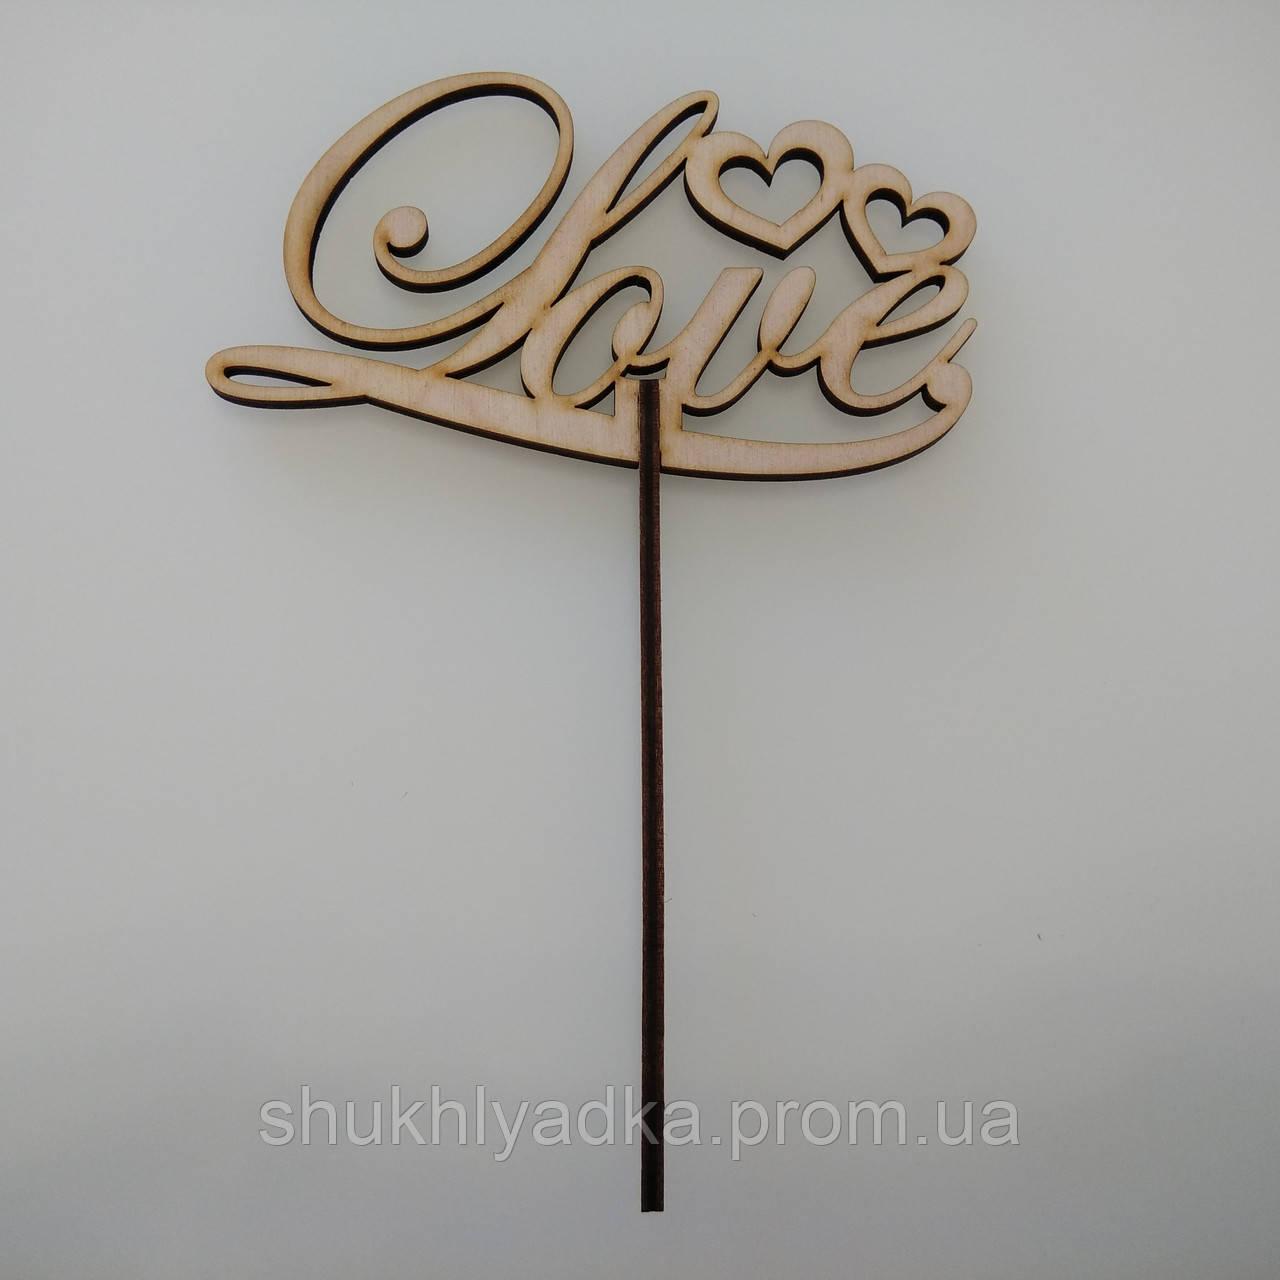 Love_2 сердца